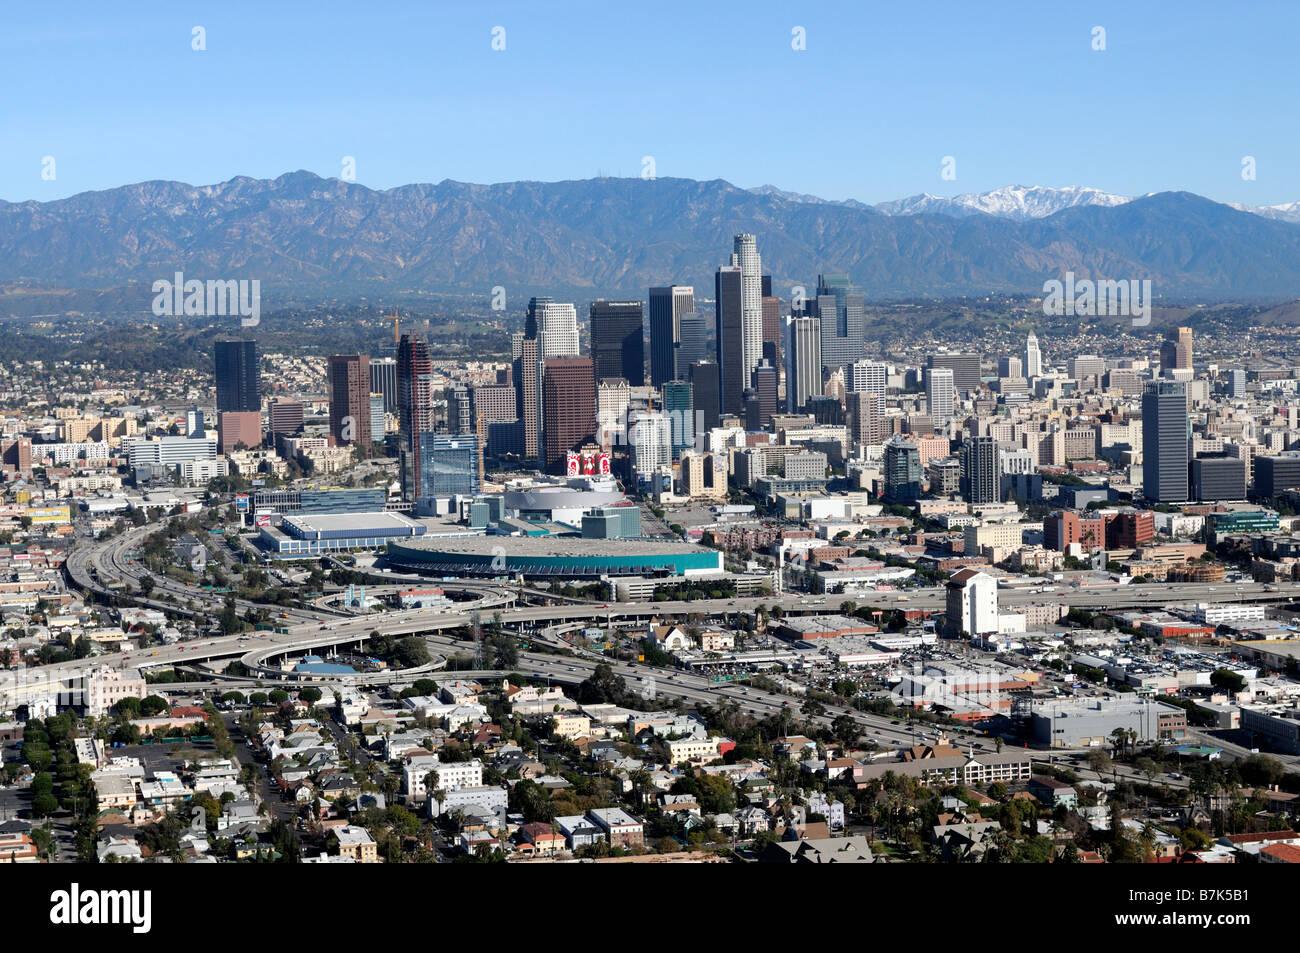 aerial view of los angeles LA urban sprawl skyline skyscrapers - Stock Image